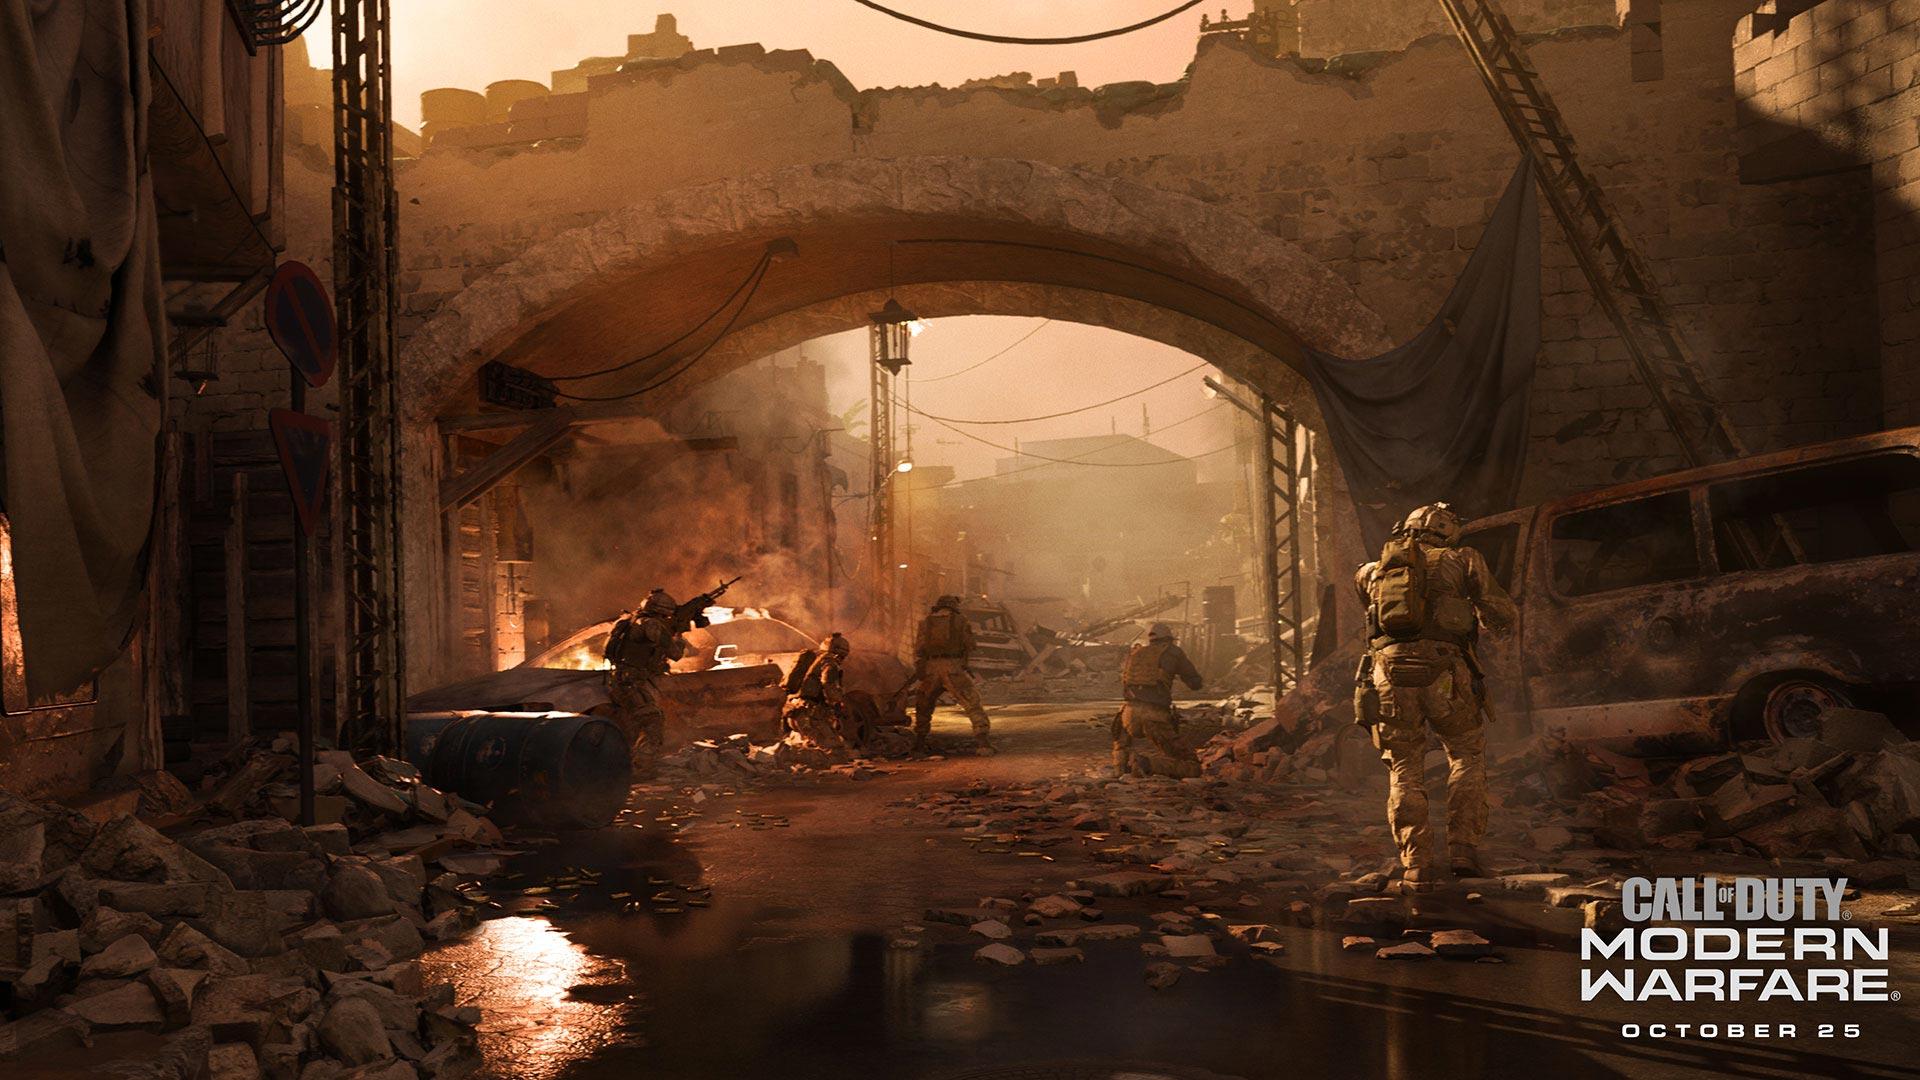 Radically different - Call of Duty: Modern Warfare